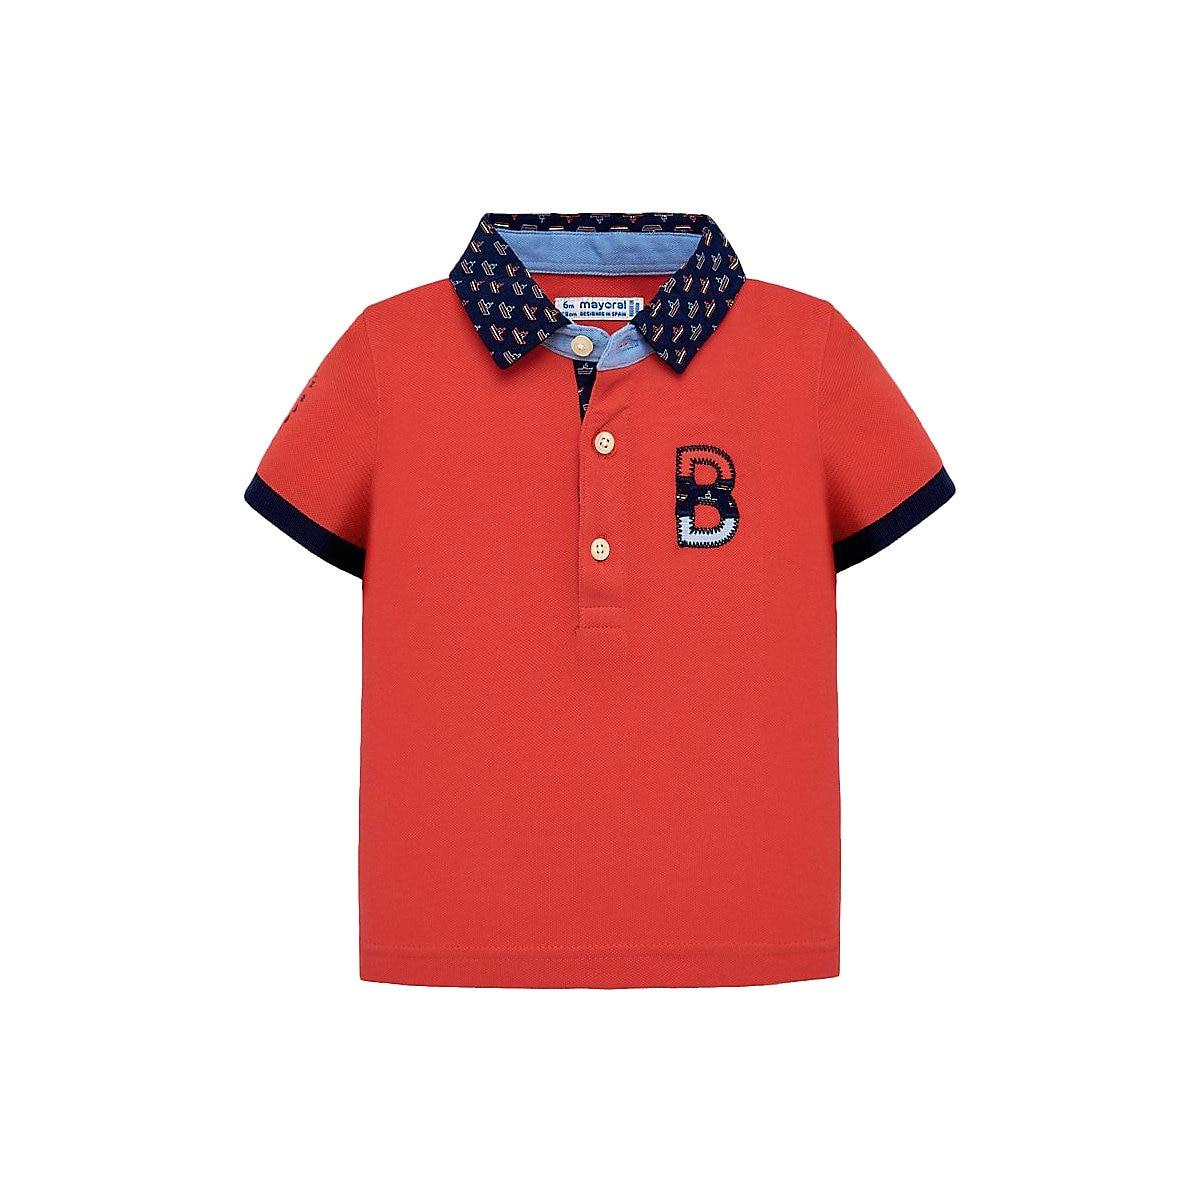 MAYORAL Polo Shirts 10681439 Children Clothing T-shirt Shirt The Print For Boys